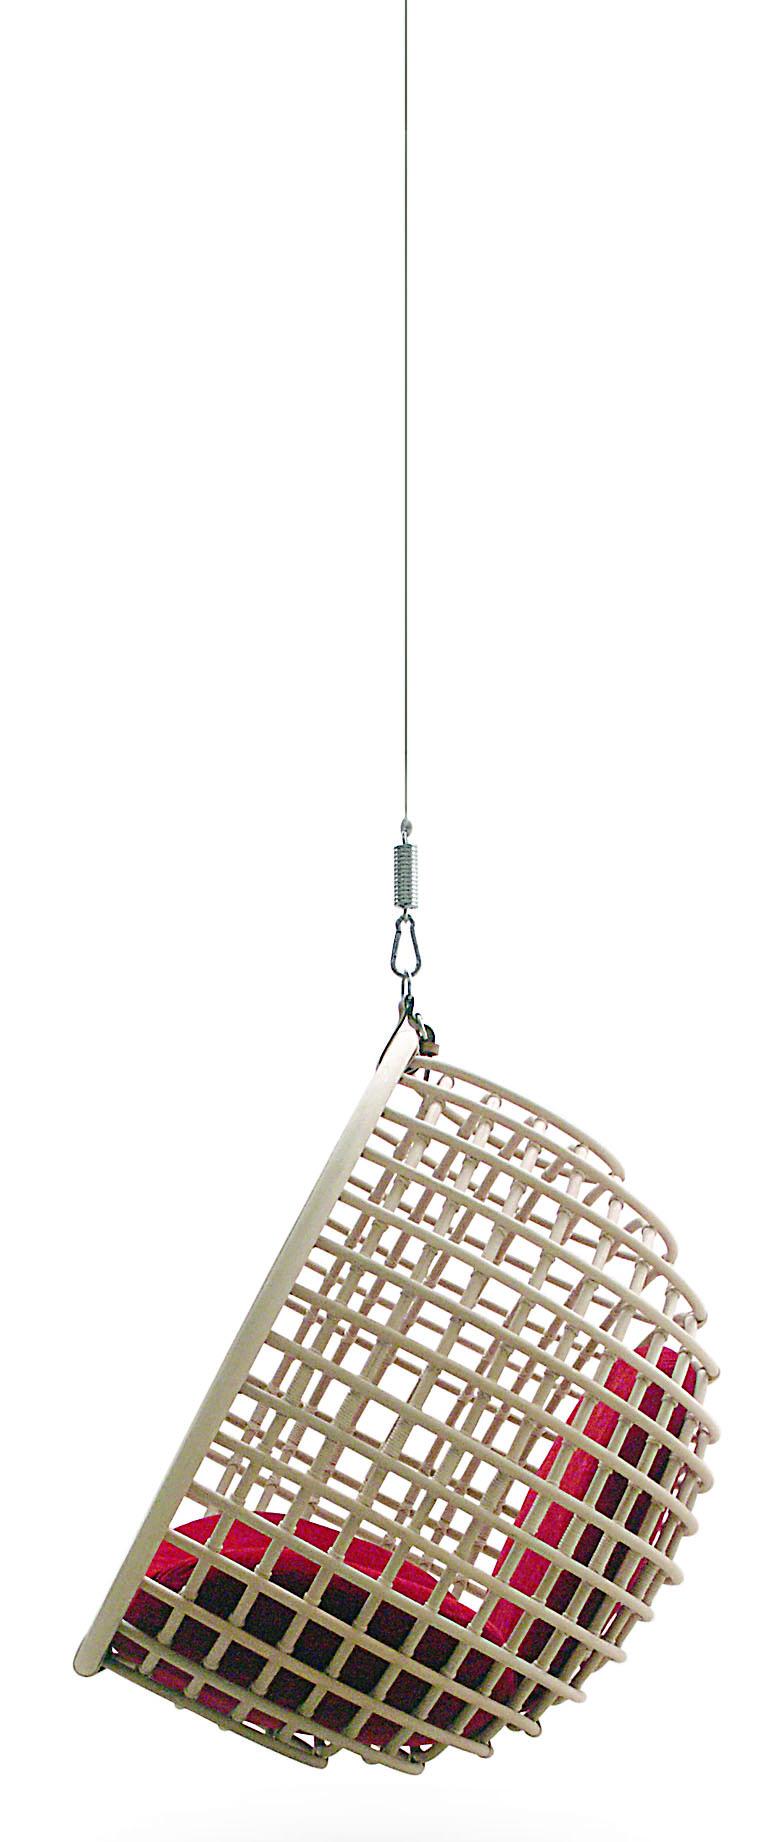 Hanging basket Chair Kata Ferlea